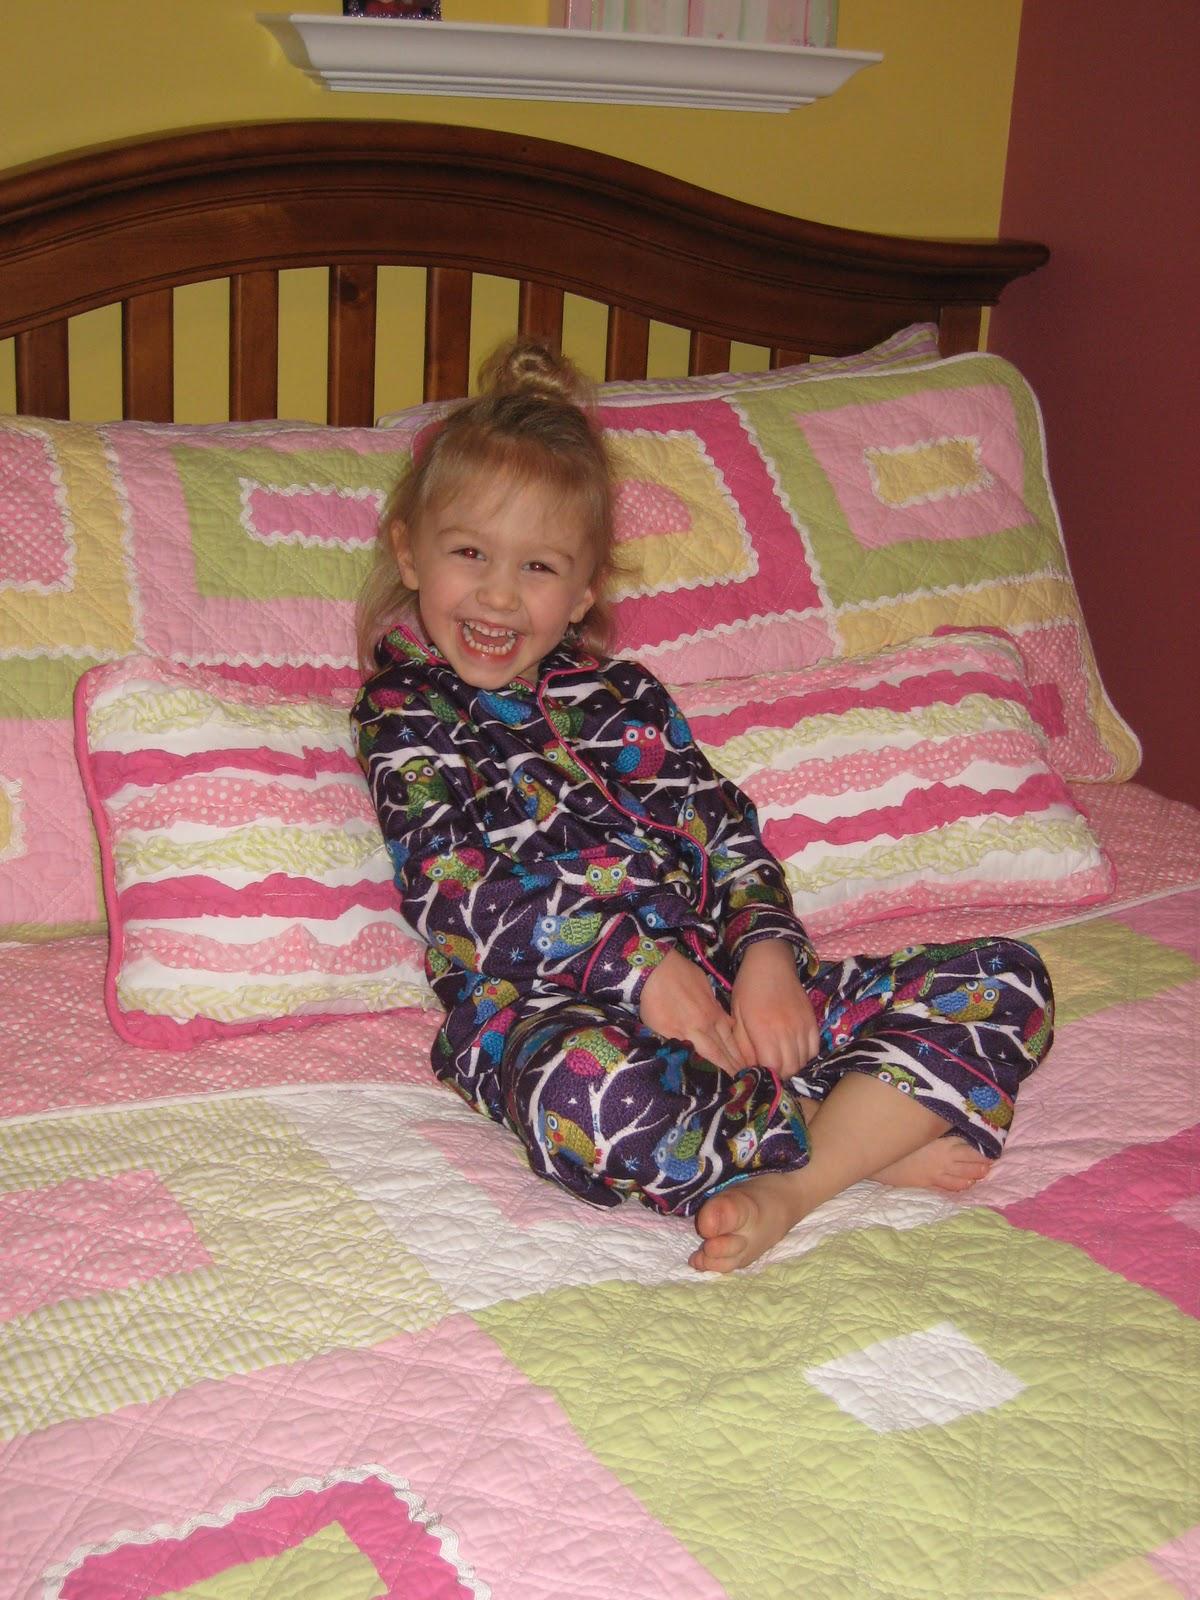 Grace Elise Amp Holtz Reagan Big Girl Bed And Florida